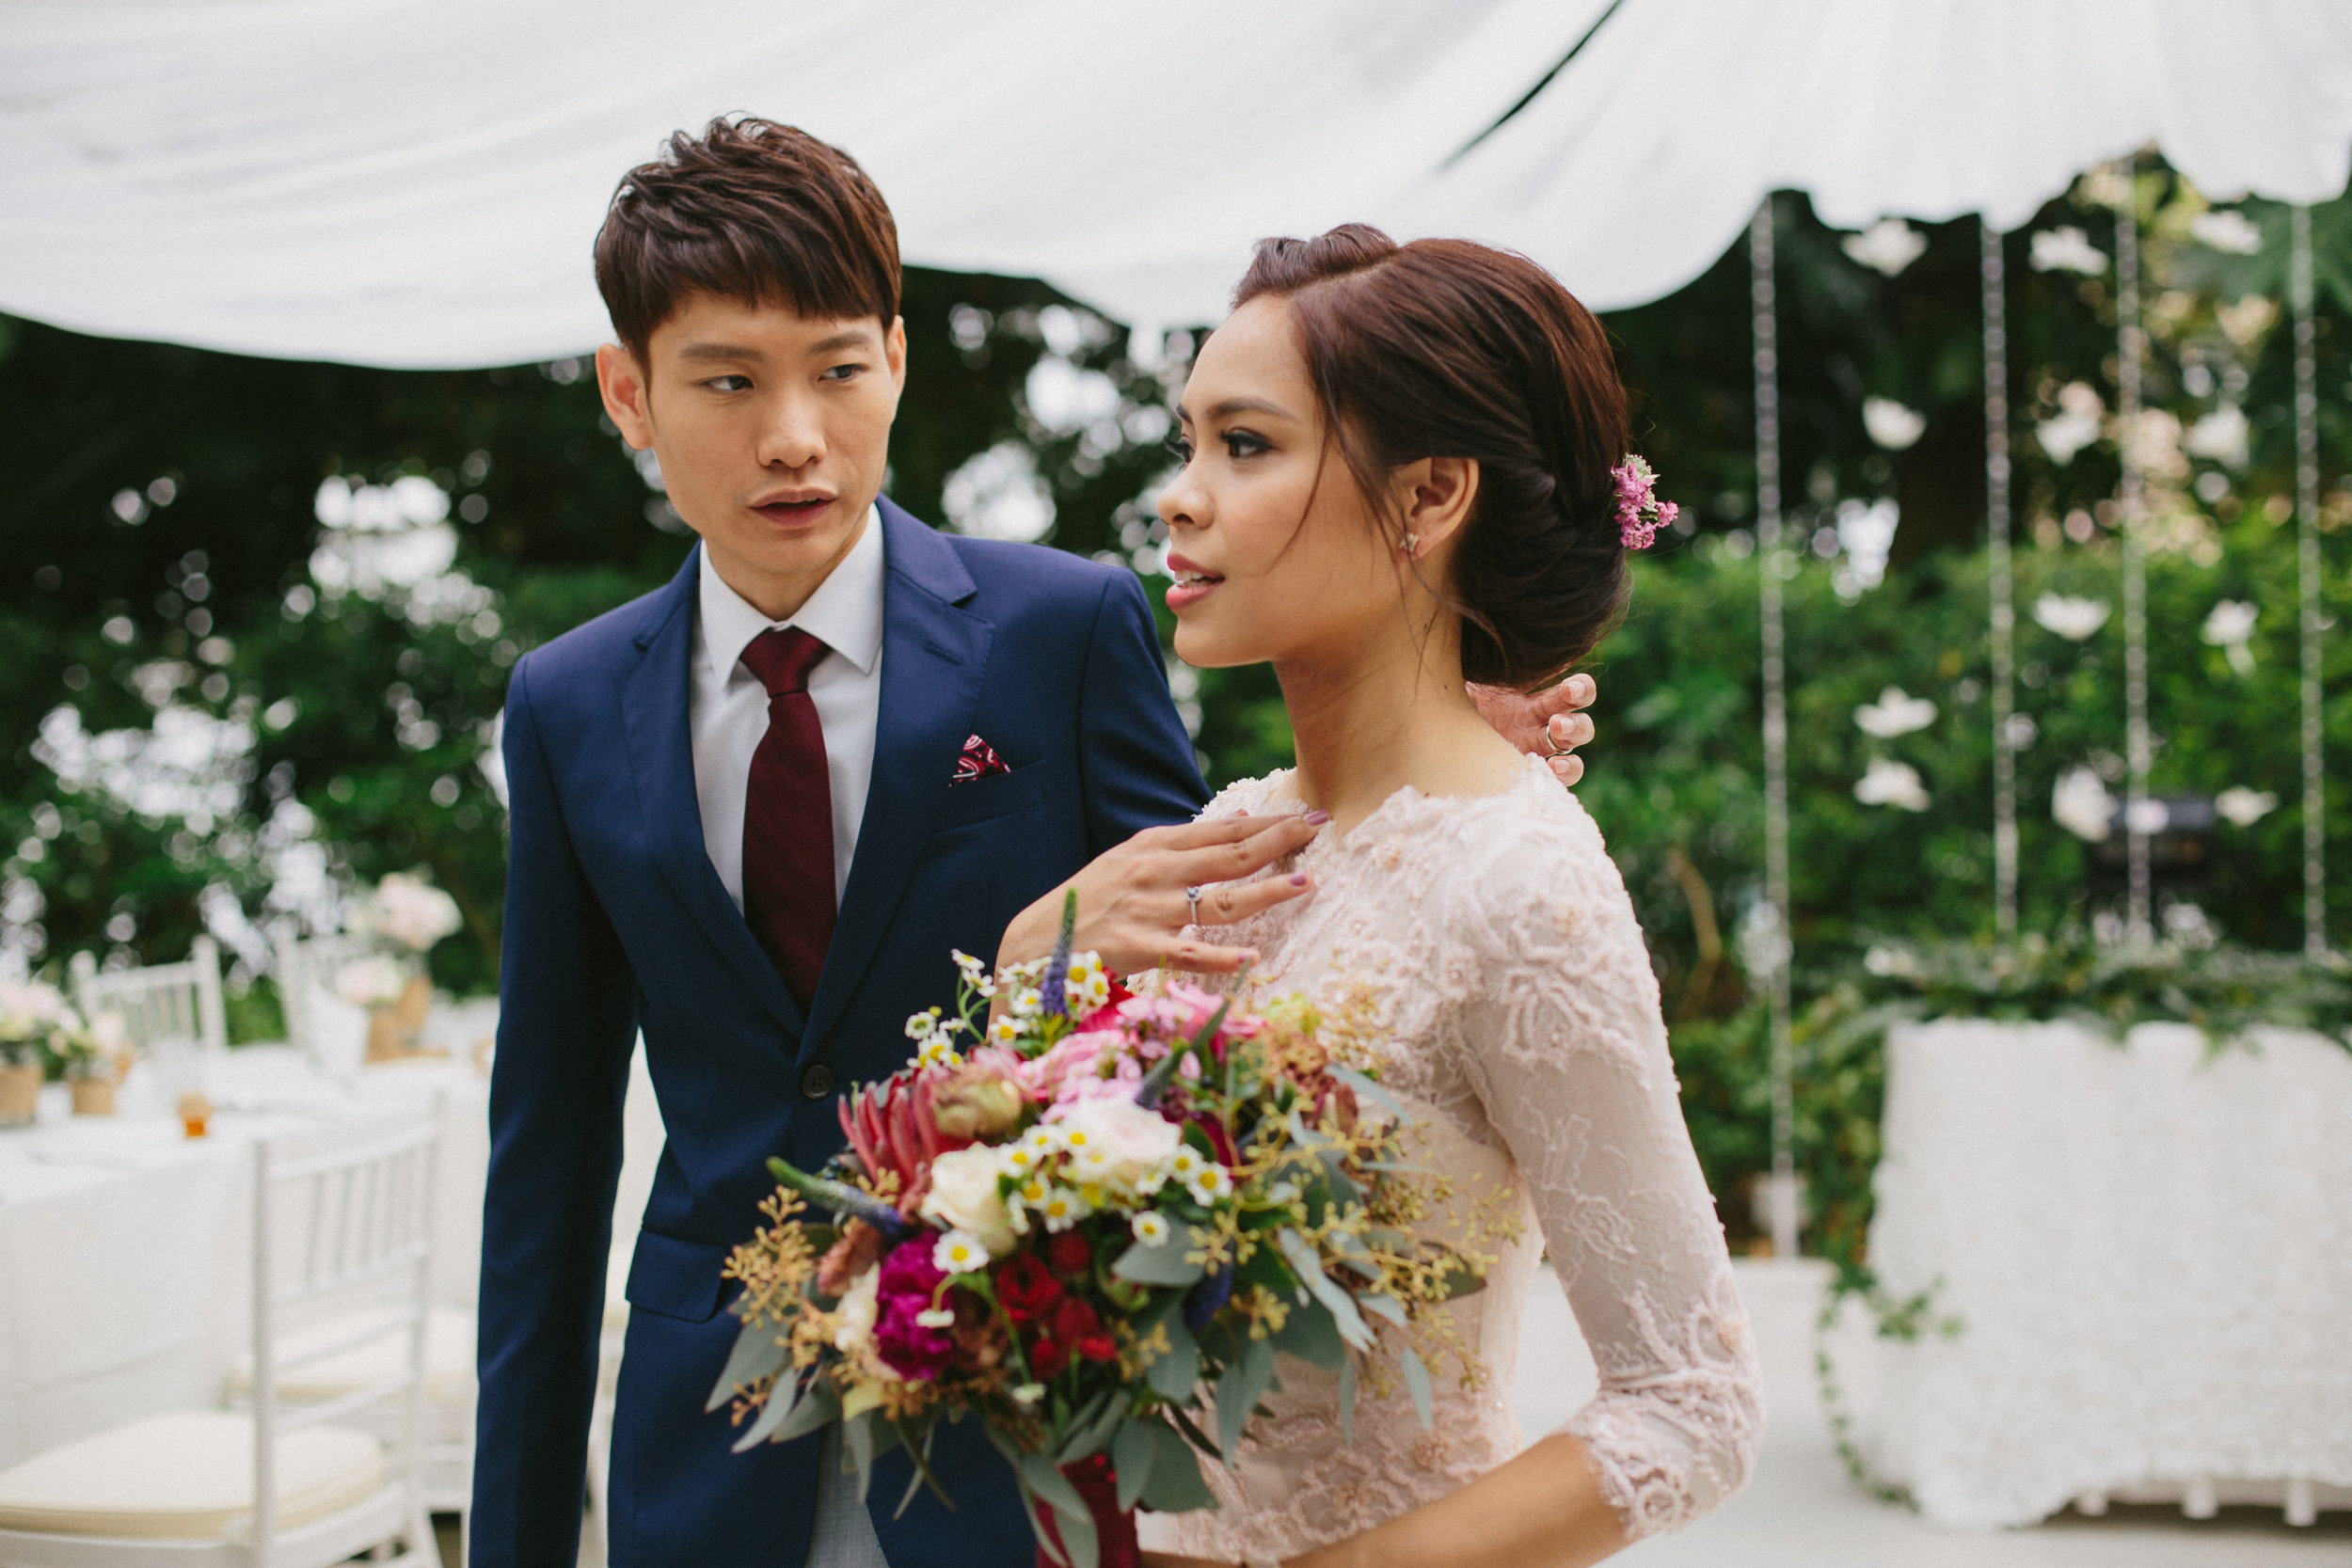 singapore-wedding-photographer-fadilah-kwan-011.jpg